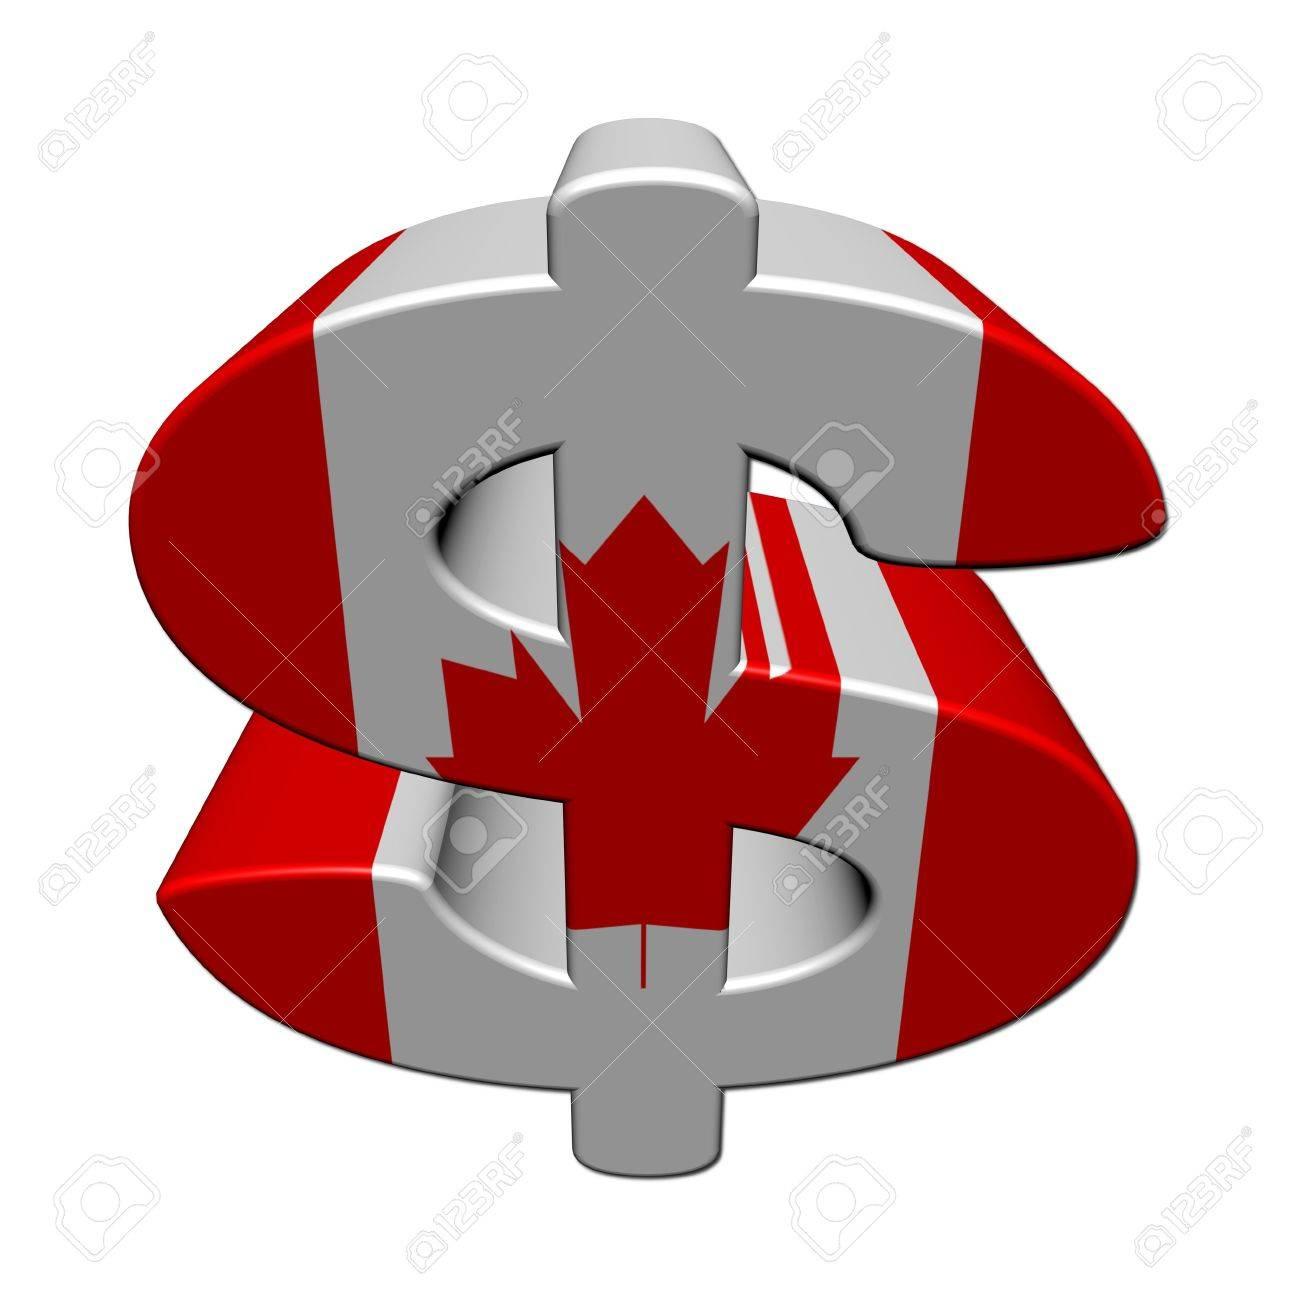 Canadian Dollar Symbol With Flag On White Illustration Stock Photo